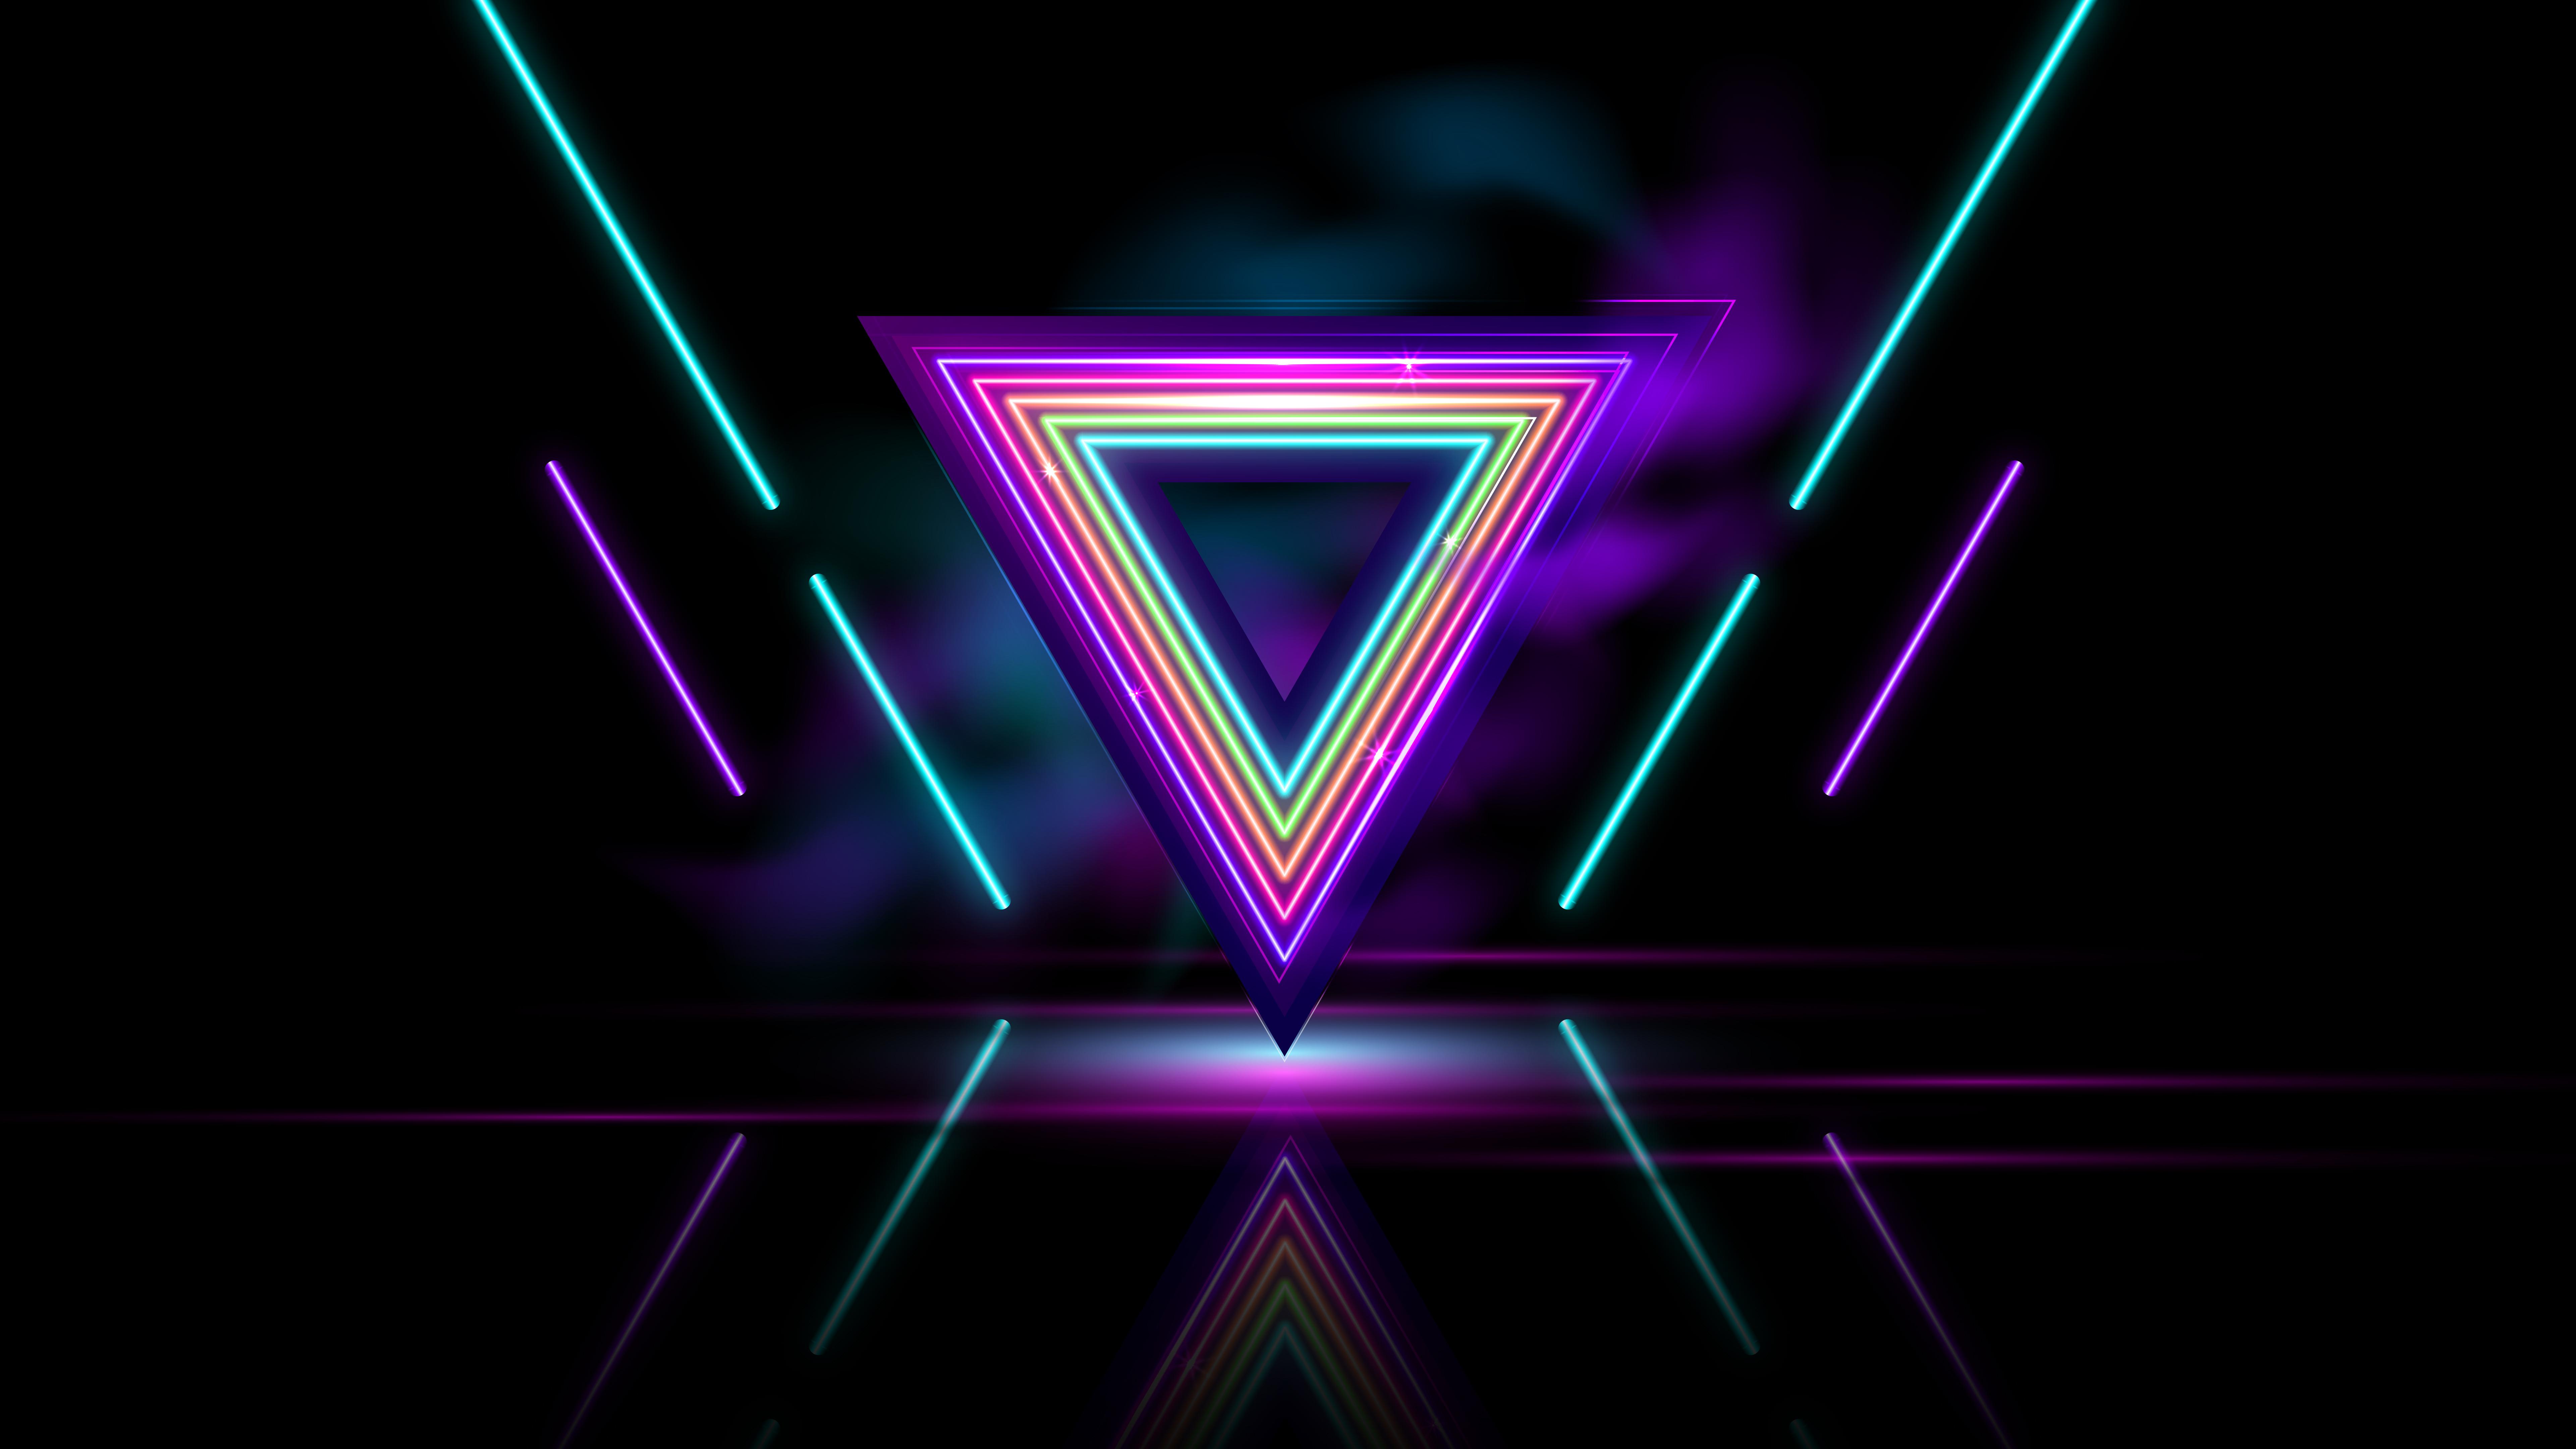 neon triangle abstract 4k 1634163894 - Neon Triangle Abstract 4k - Neon Triangle Abstract wallpapers, Neon Triangle Abstract 4k wallpapers